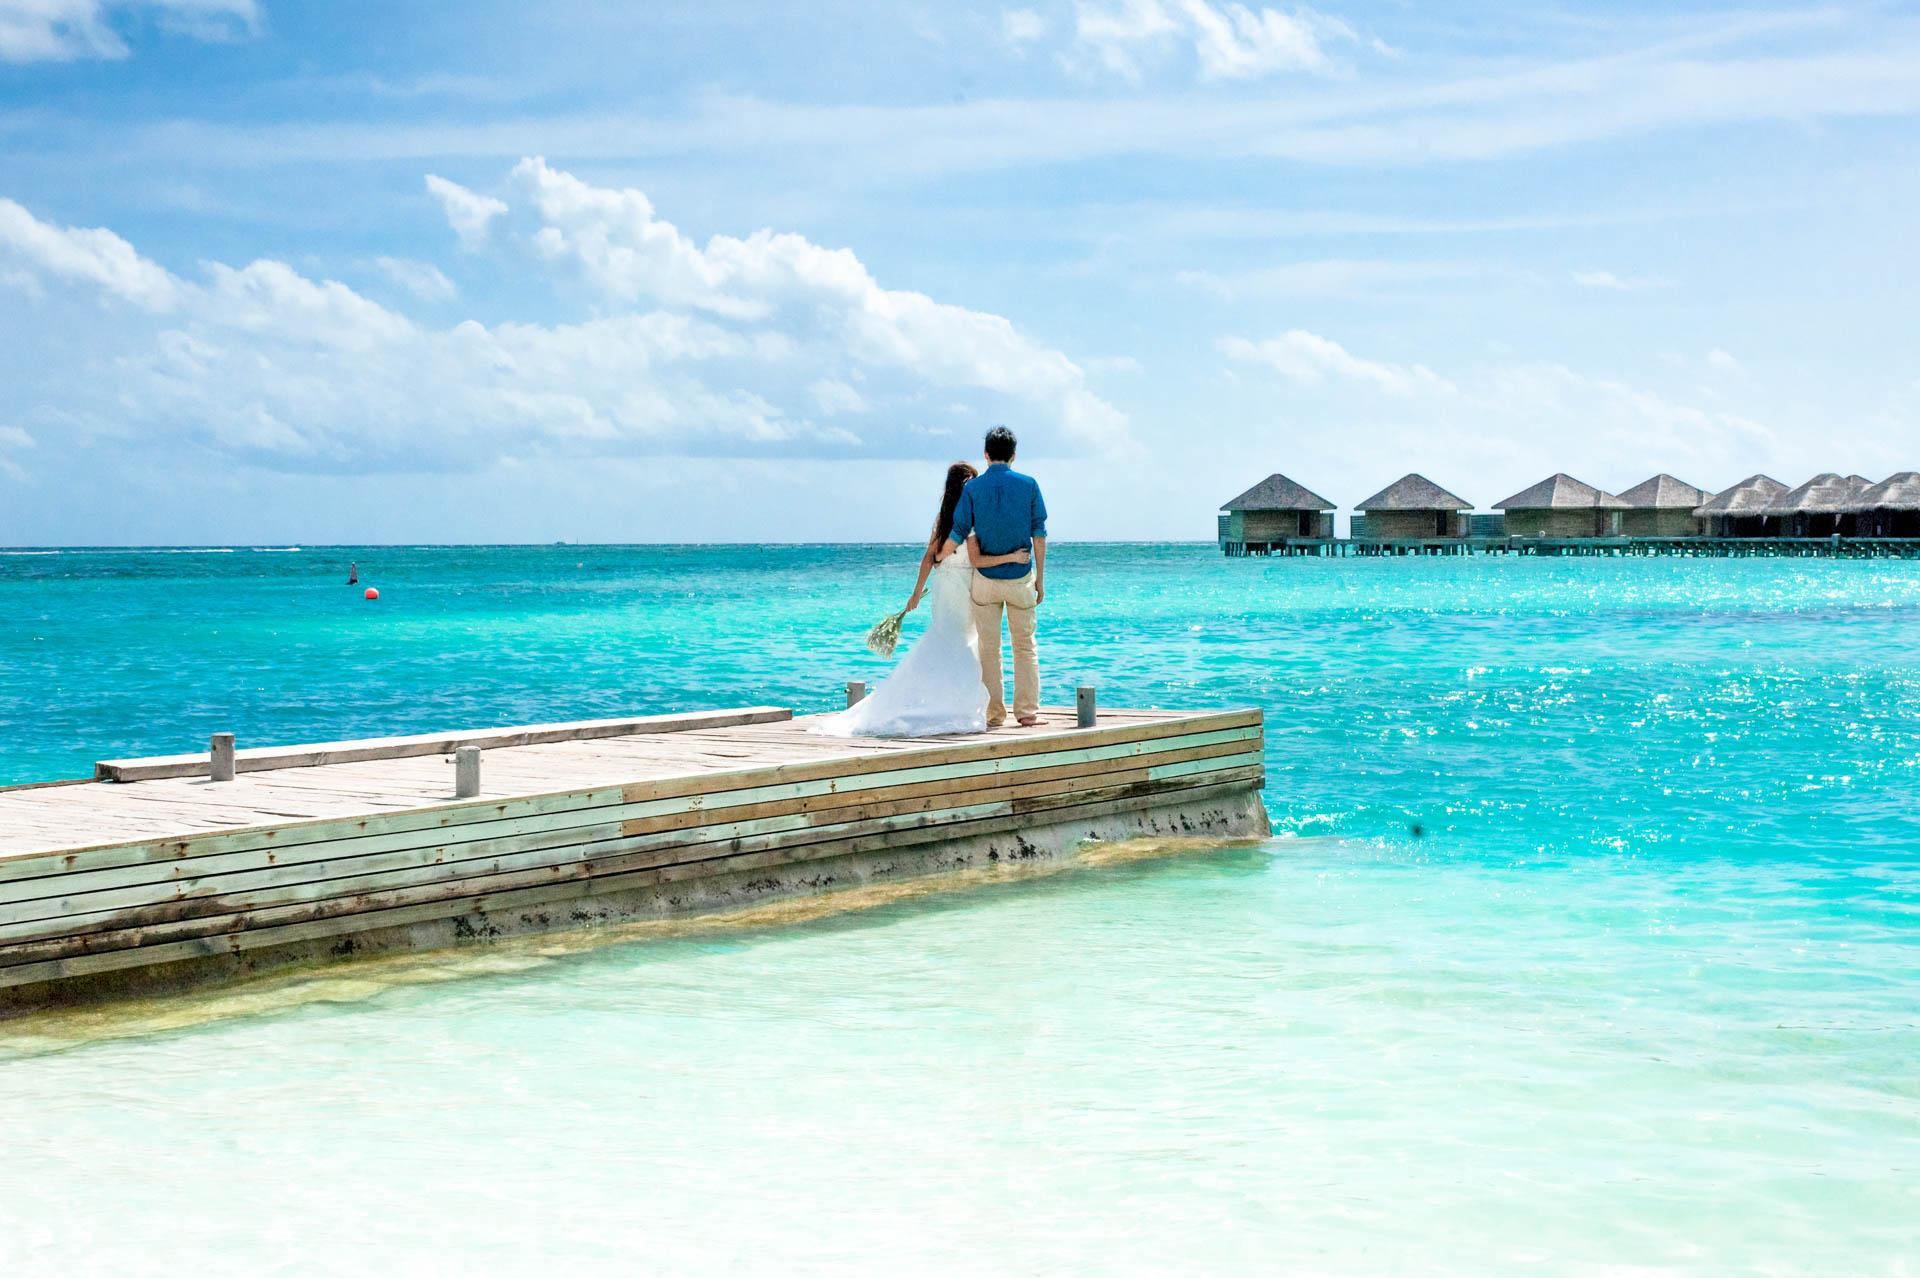 Charmy and Samson Honeymoon Photoshoot at Anantara Dhigu Veli and Naladhu Resort in Maldives by Asads Photography 1